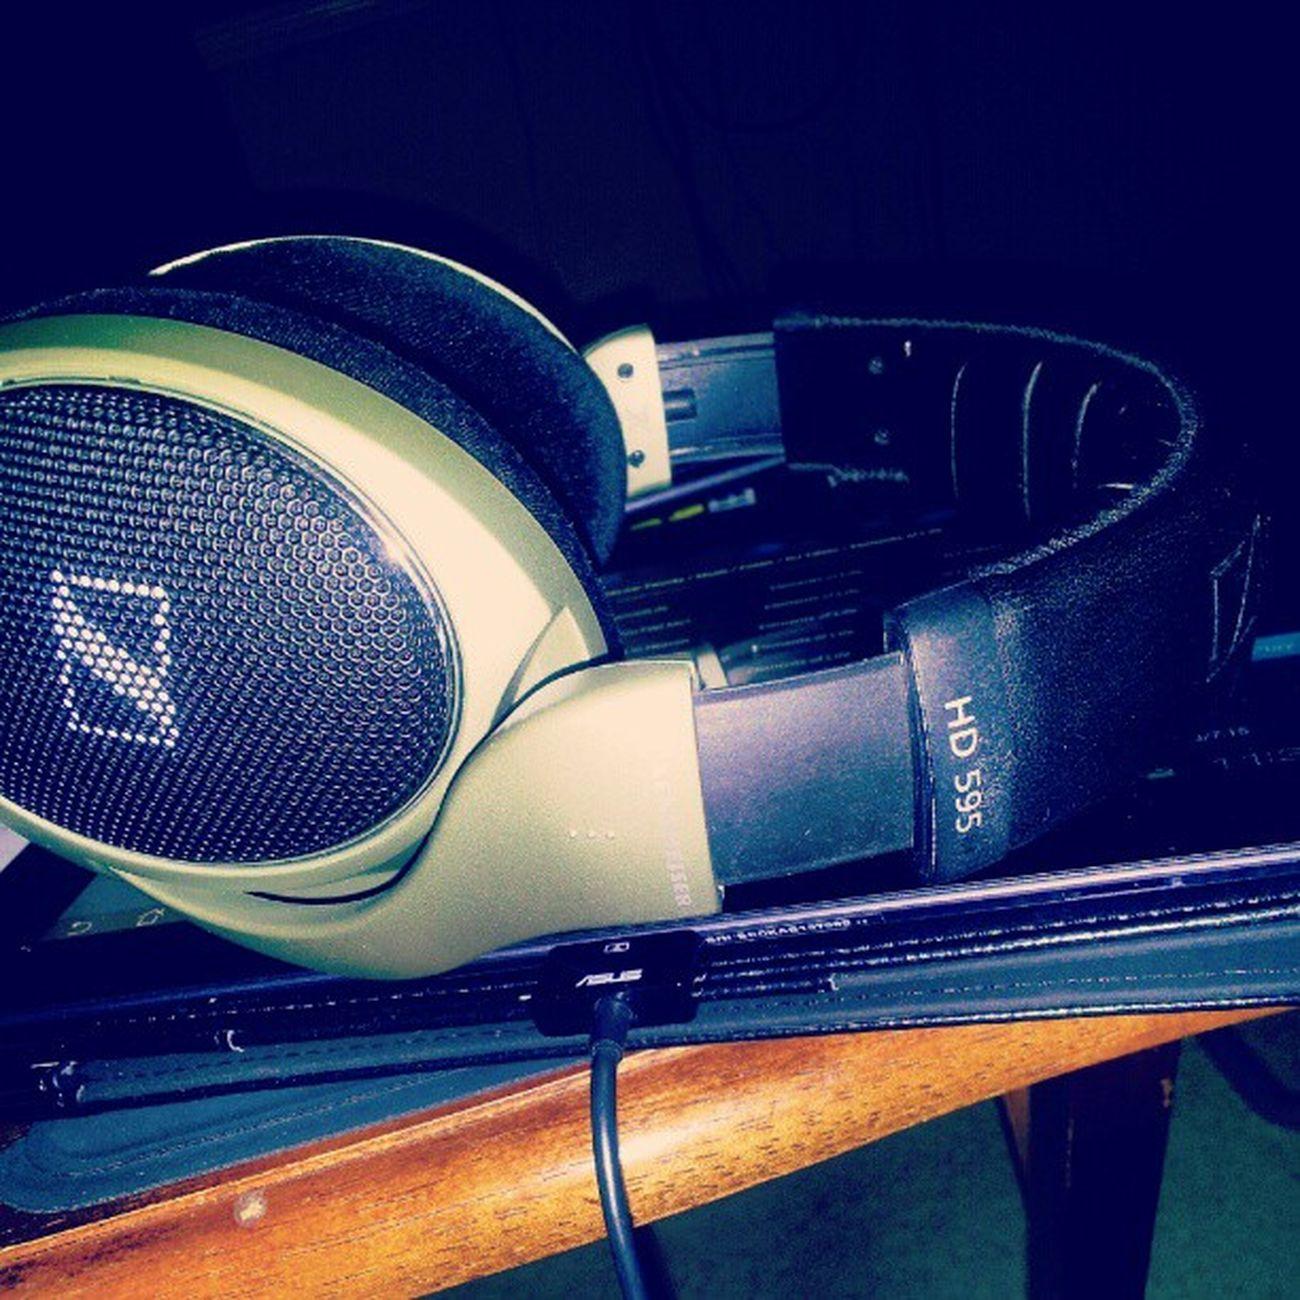 Tiesto sounds so dam good with my Sennheiser HD595 Headphones Working Late Overtime